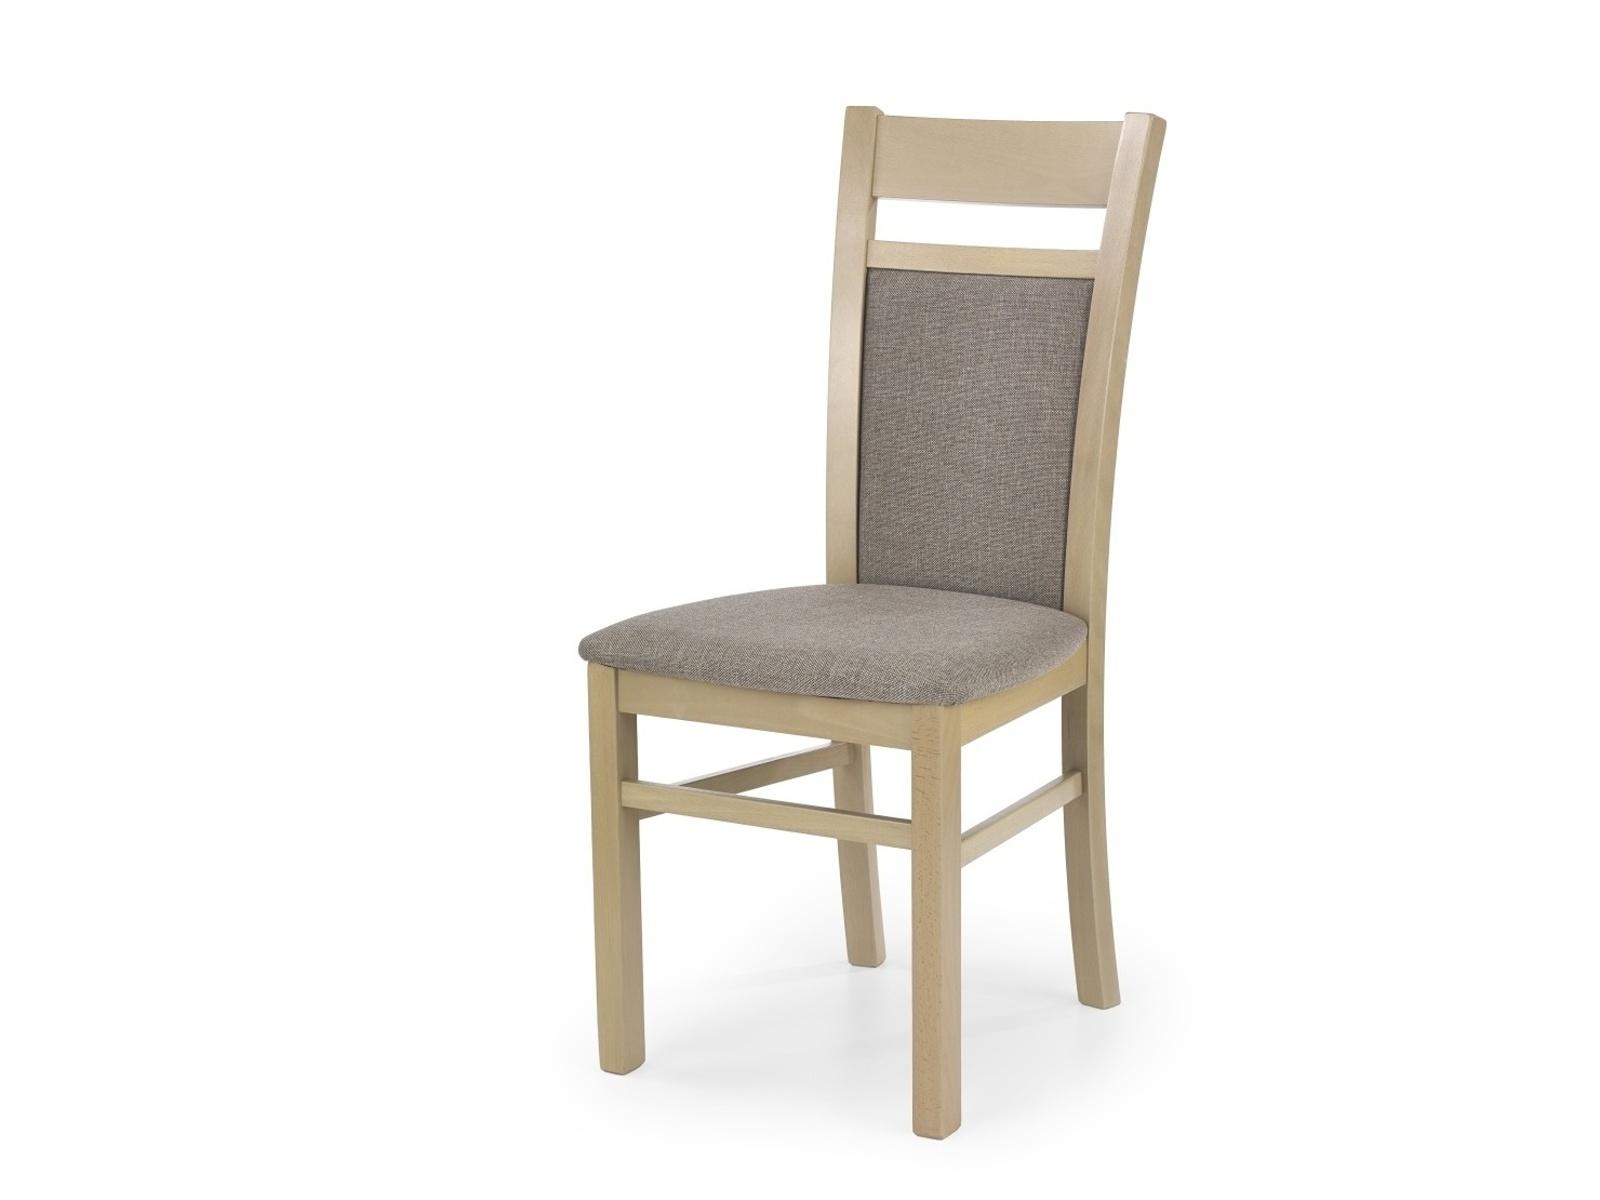 Halmar Jídelní židle GERARD 2, dub sonoma